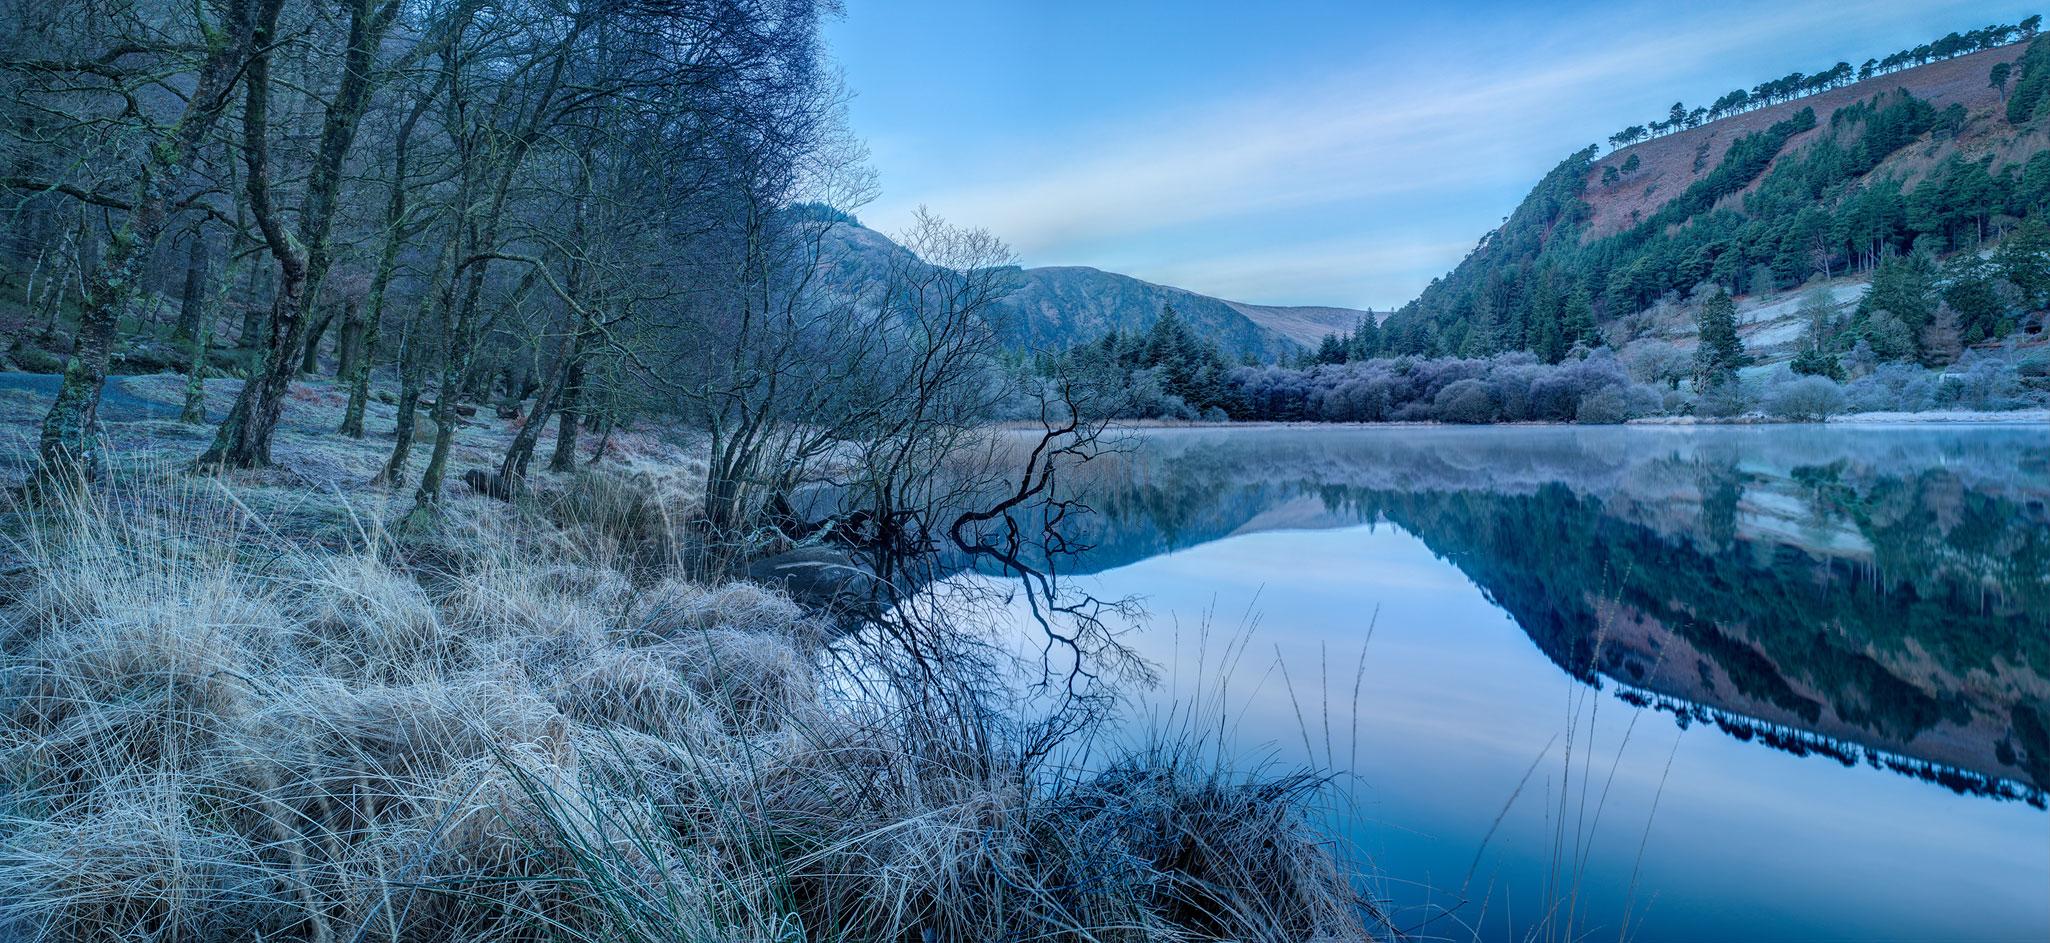 Glendalough Lower Lake, irish landscape photos